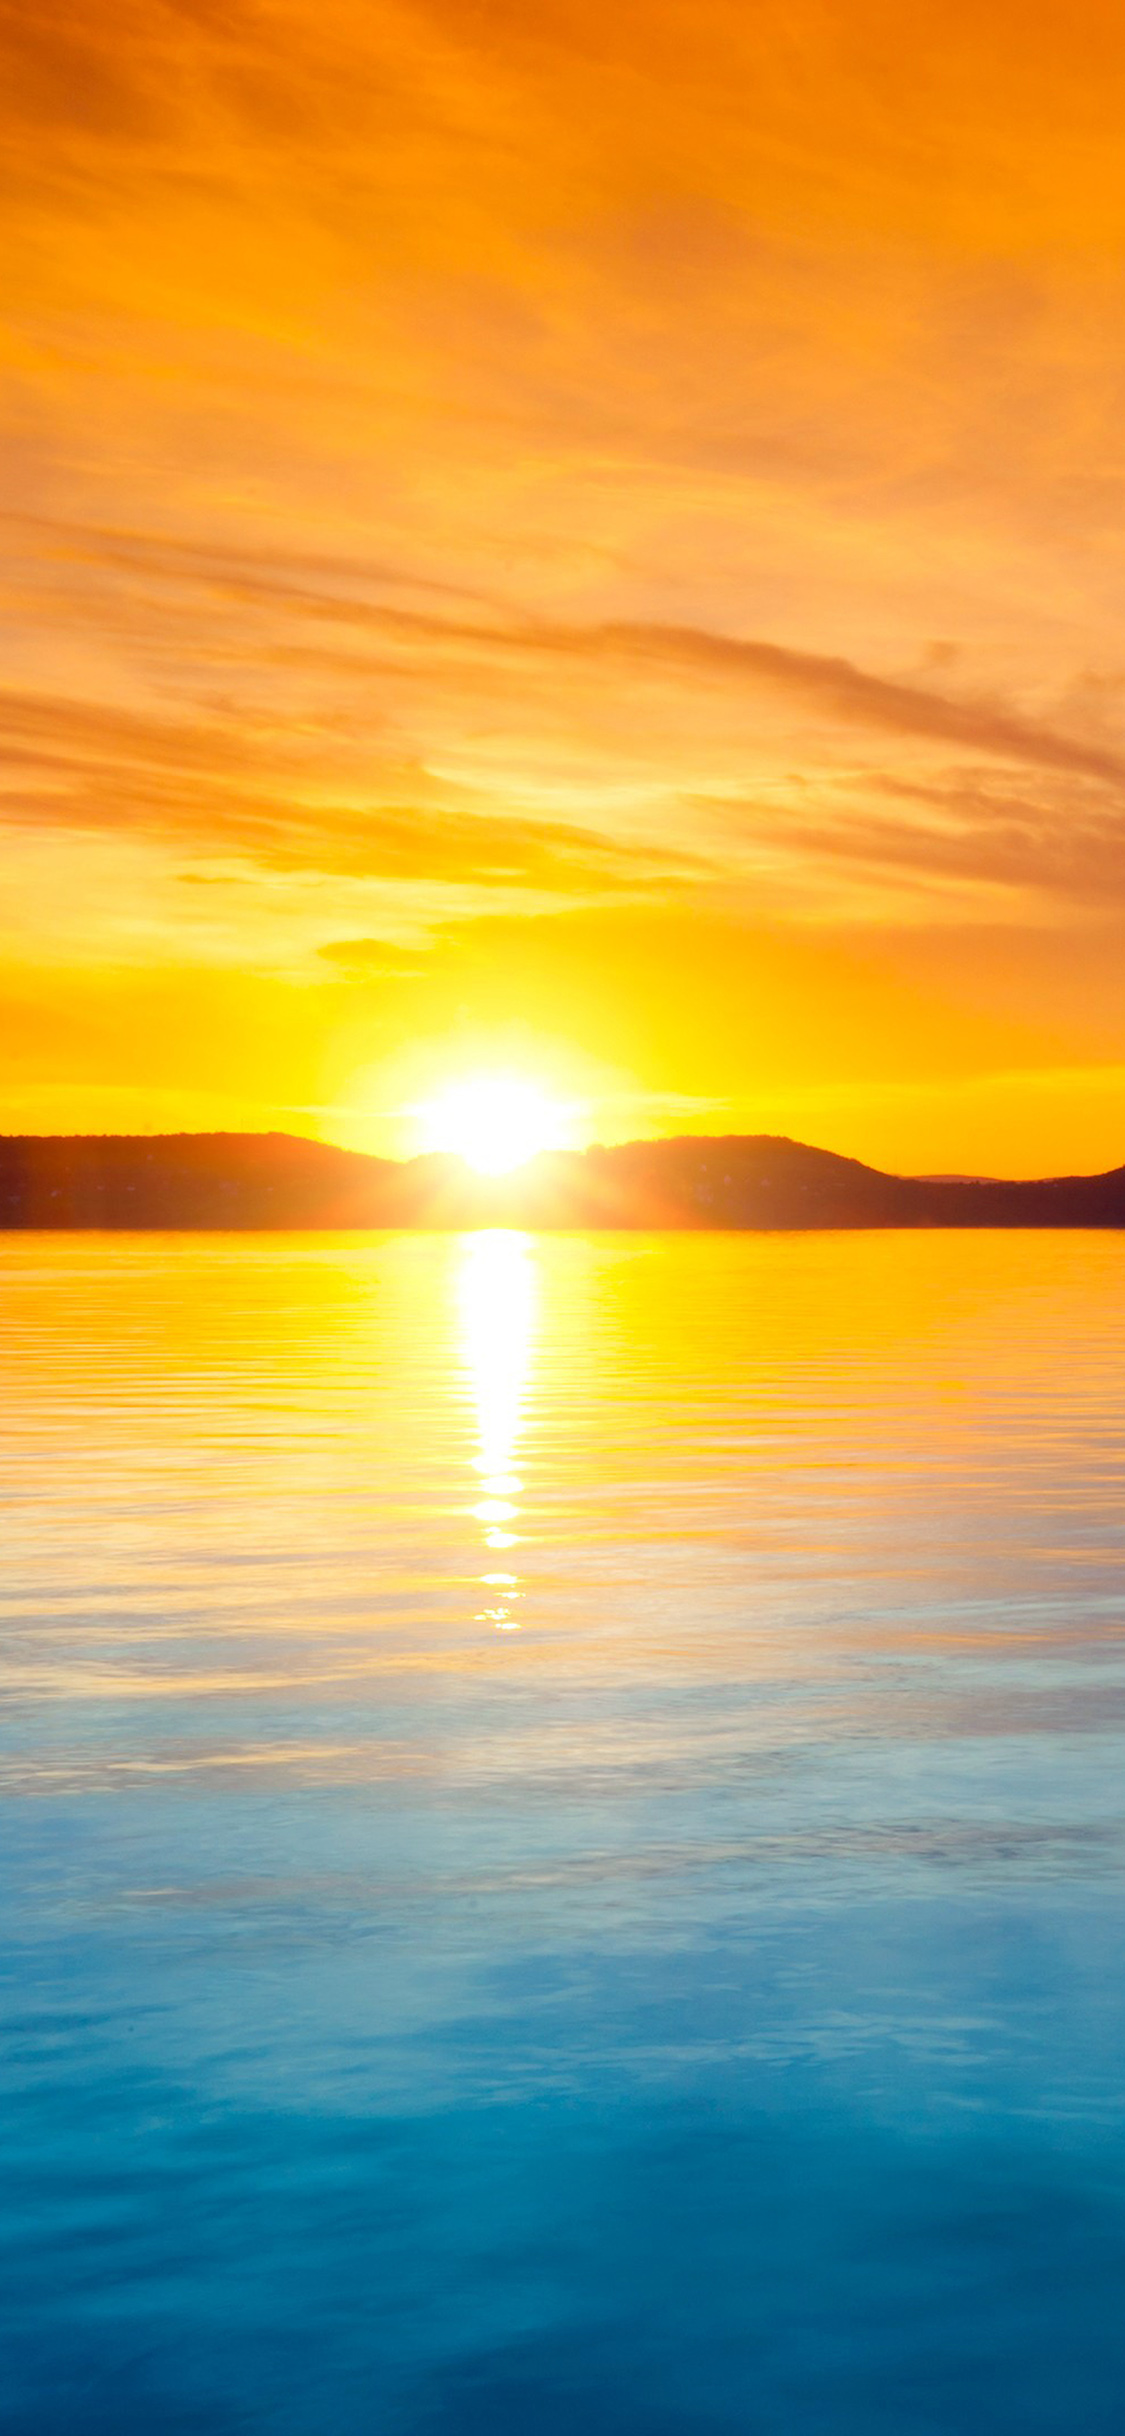 iPhonexpapers.com-Apple-iPhone-wallpaper-mq39-sunset-night-lake-water-sky-orange